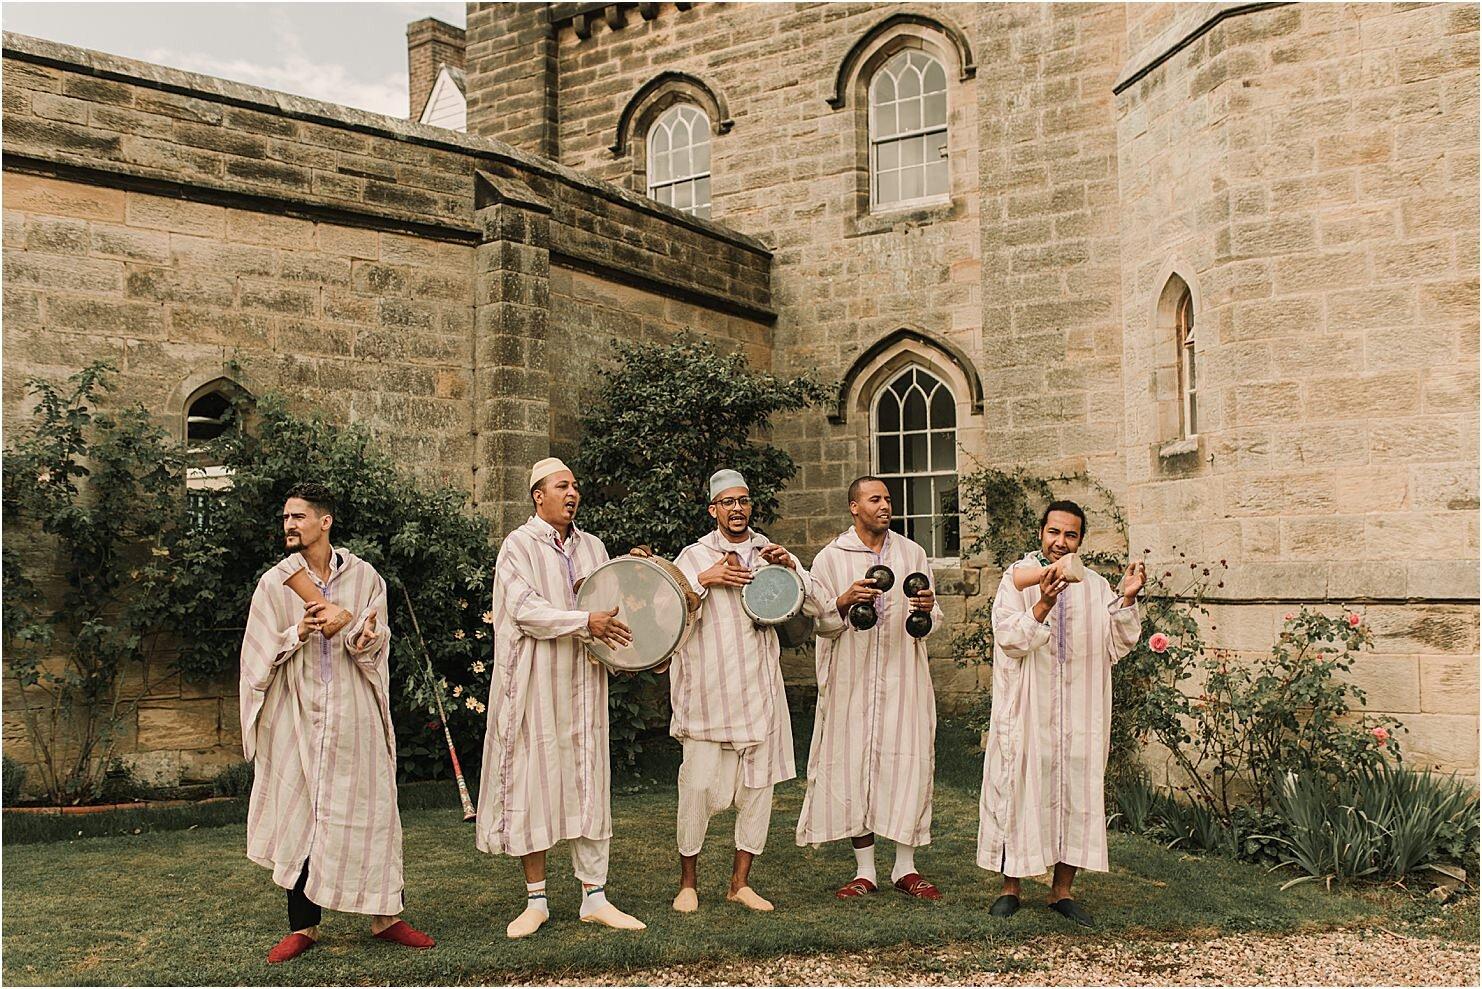 boda-de-cuento-en-castillo-boda-en-londres-110.jpg